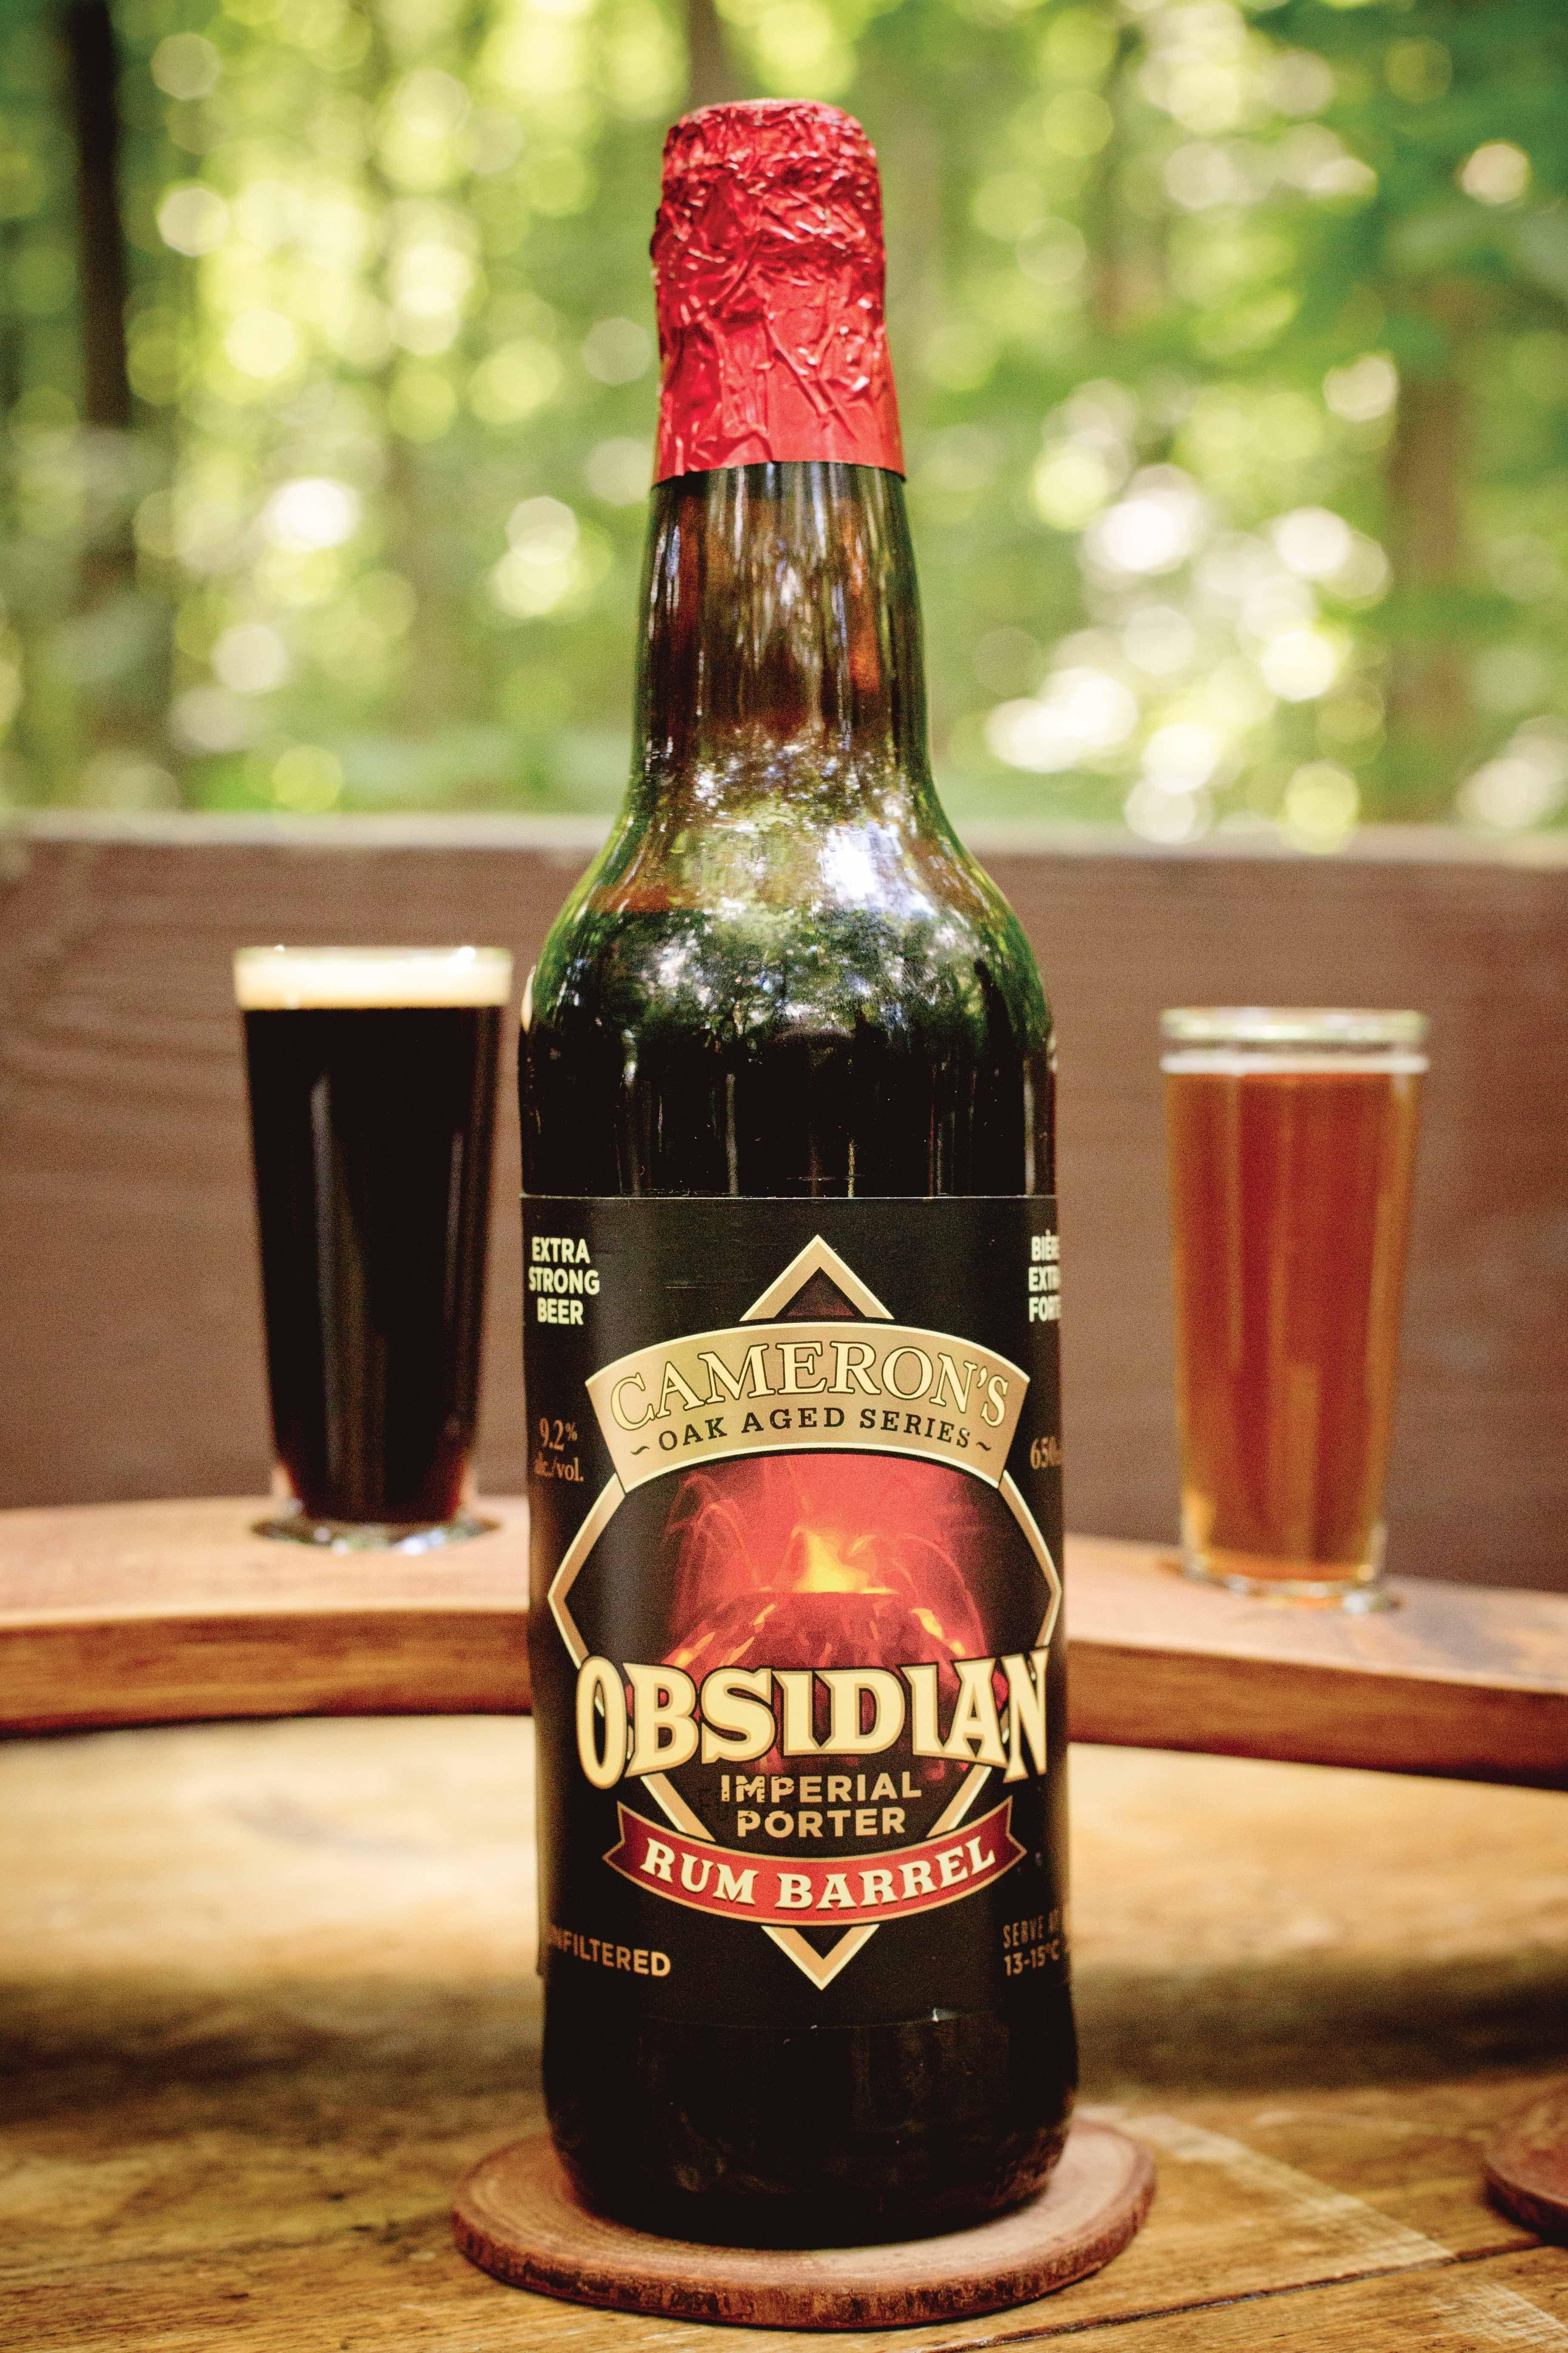 Obsidian Imperial Porter Rum Barrel Aged 9.2 Cameron's